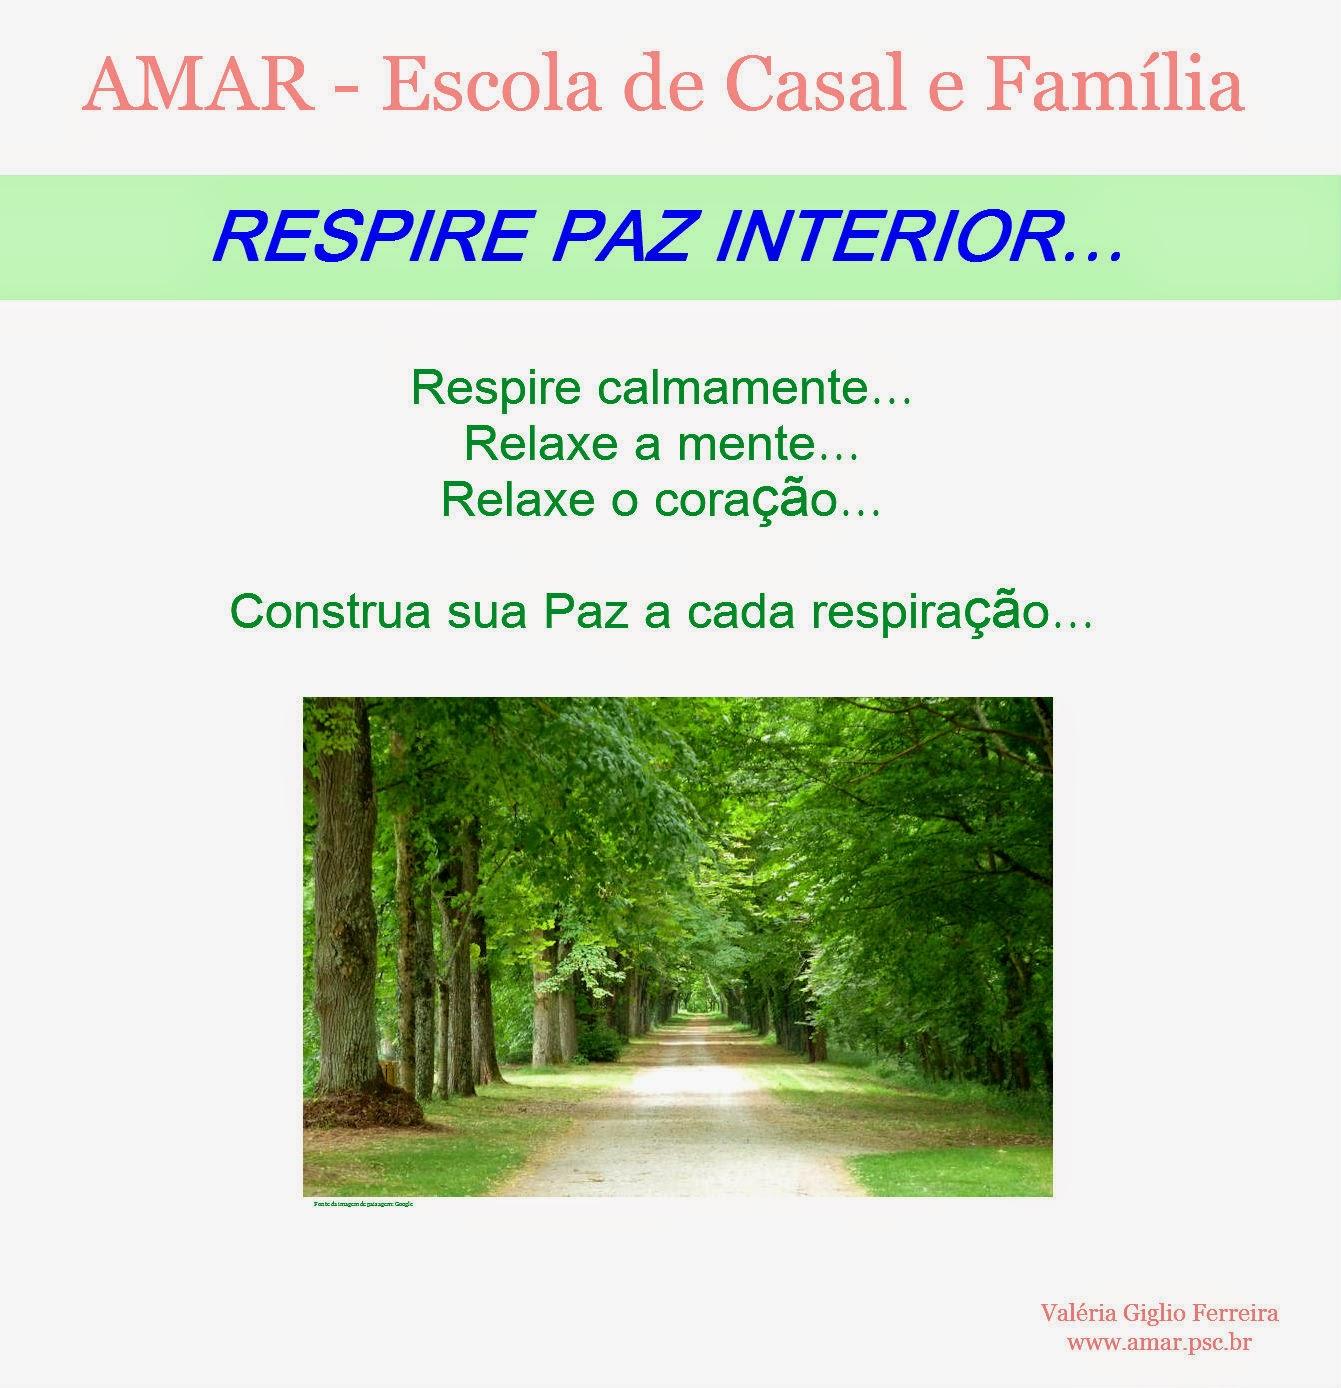 Respire Paz Interior...